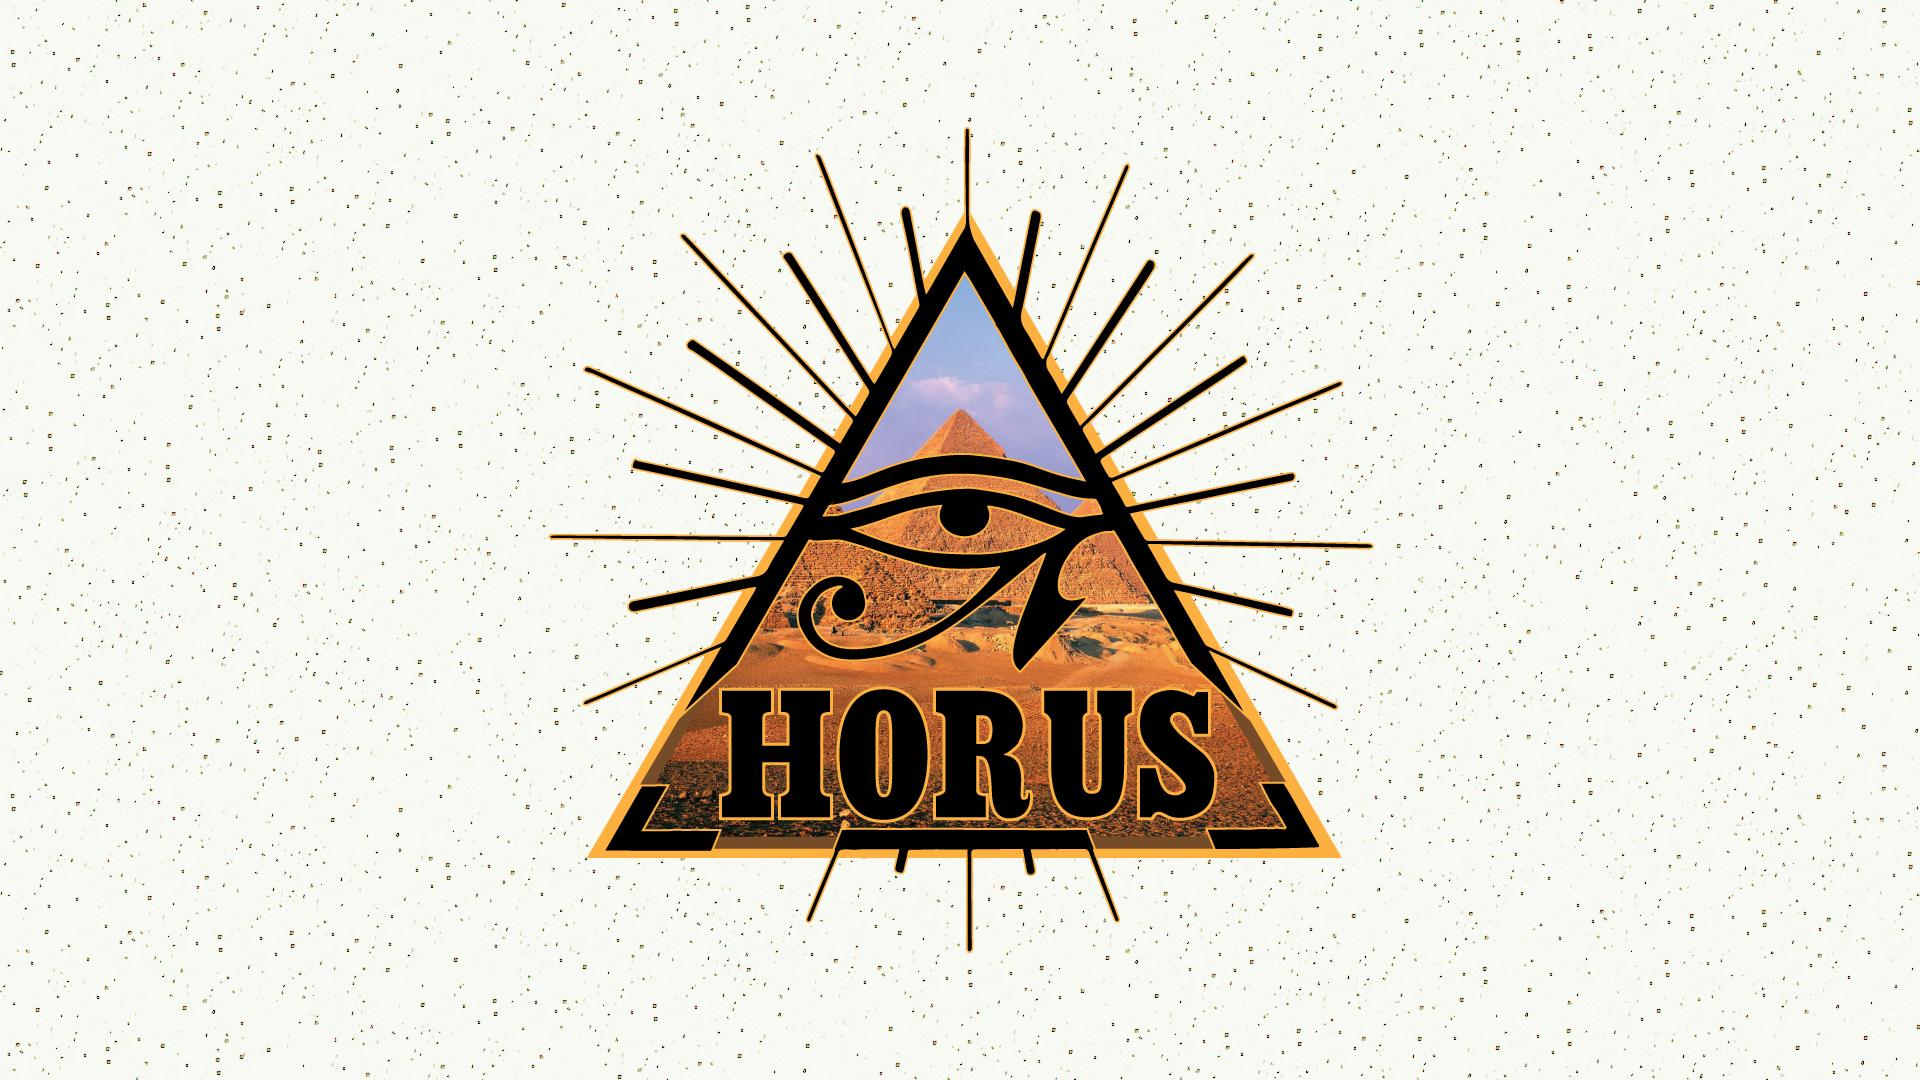 General 1920x1080 Eye of Horus Horus (deity) Egypt pyramid triangle